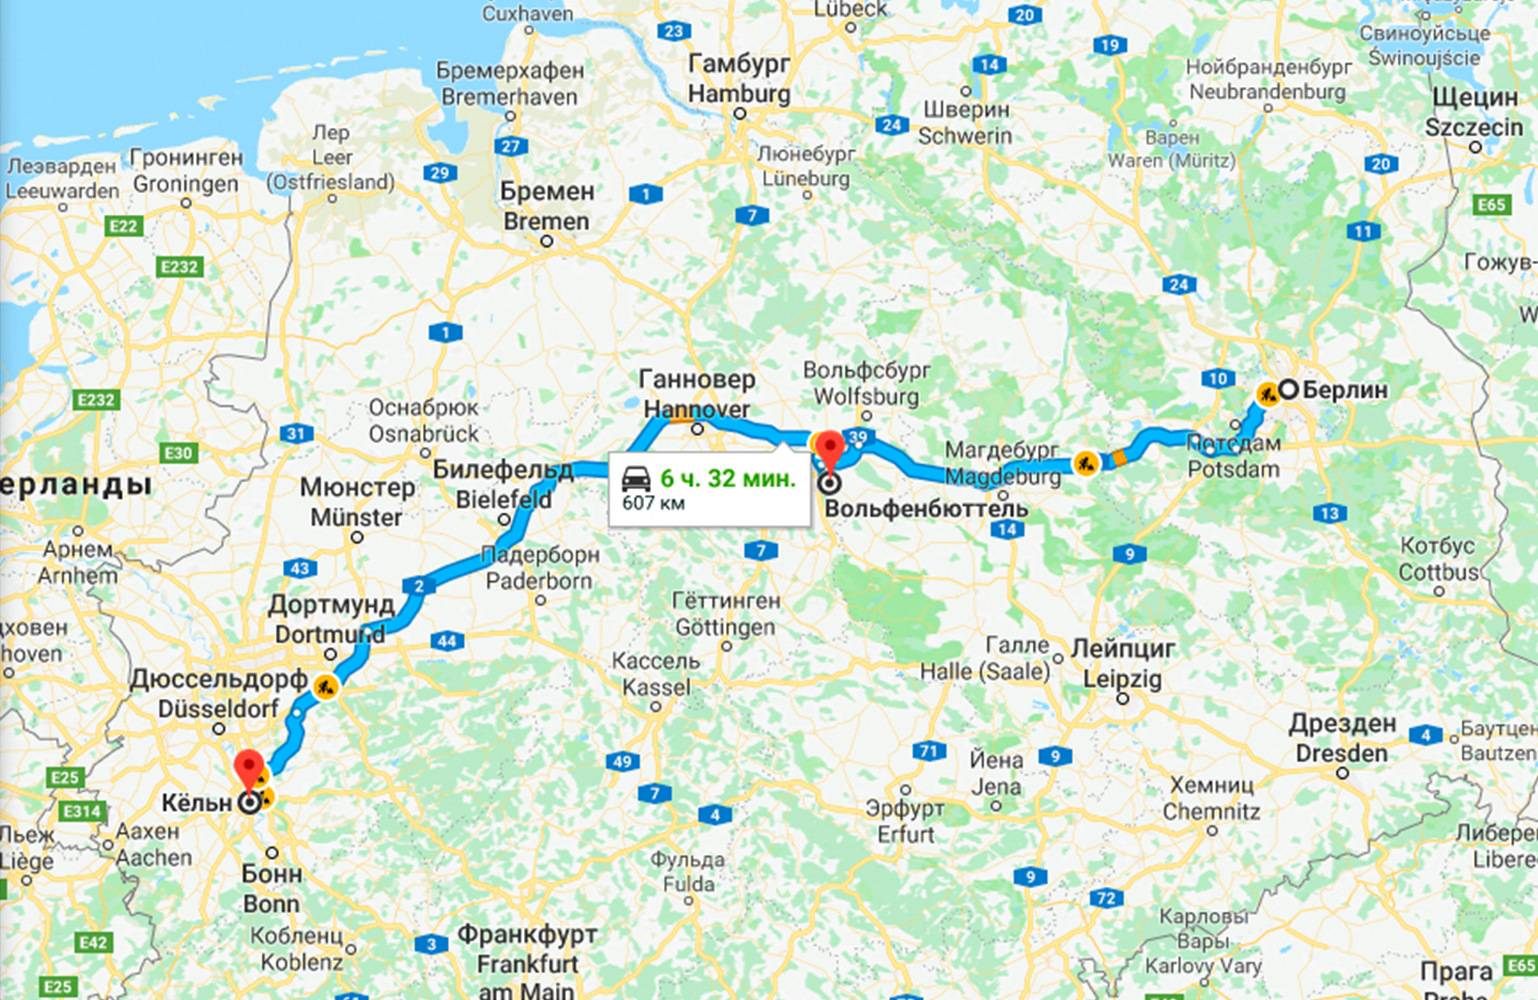 Проложенный маршрут от франкфурта-на-одере до праги